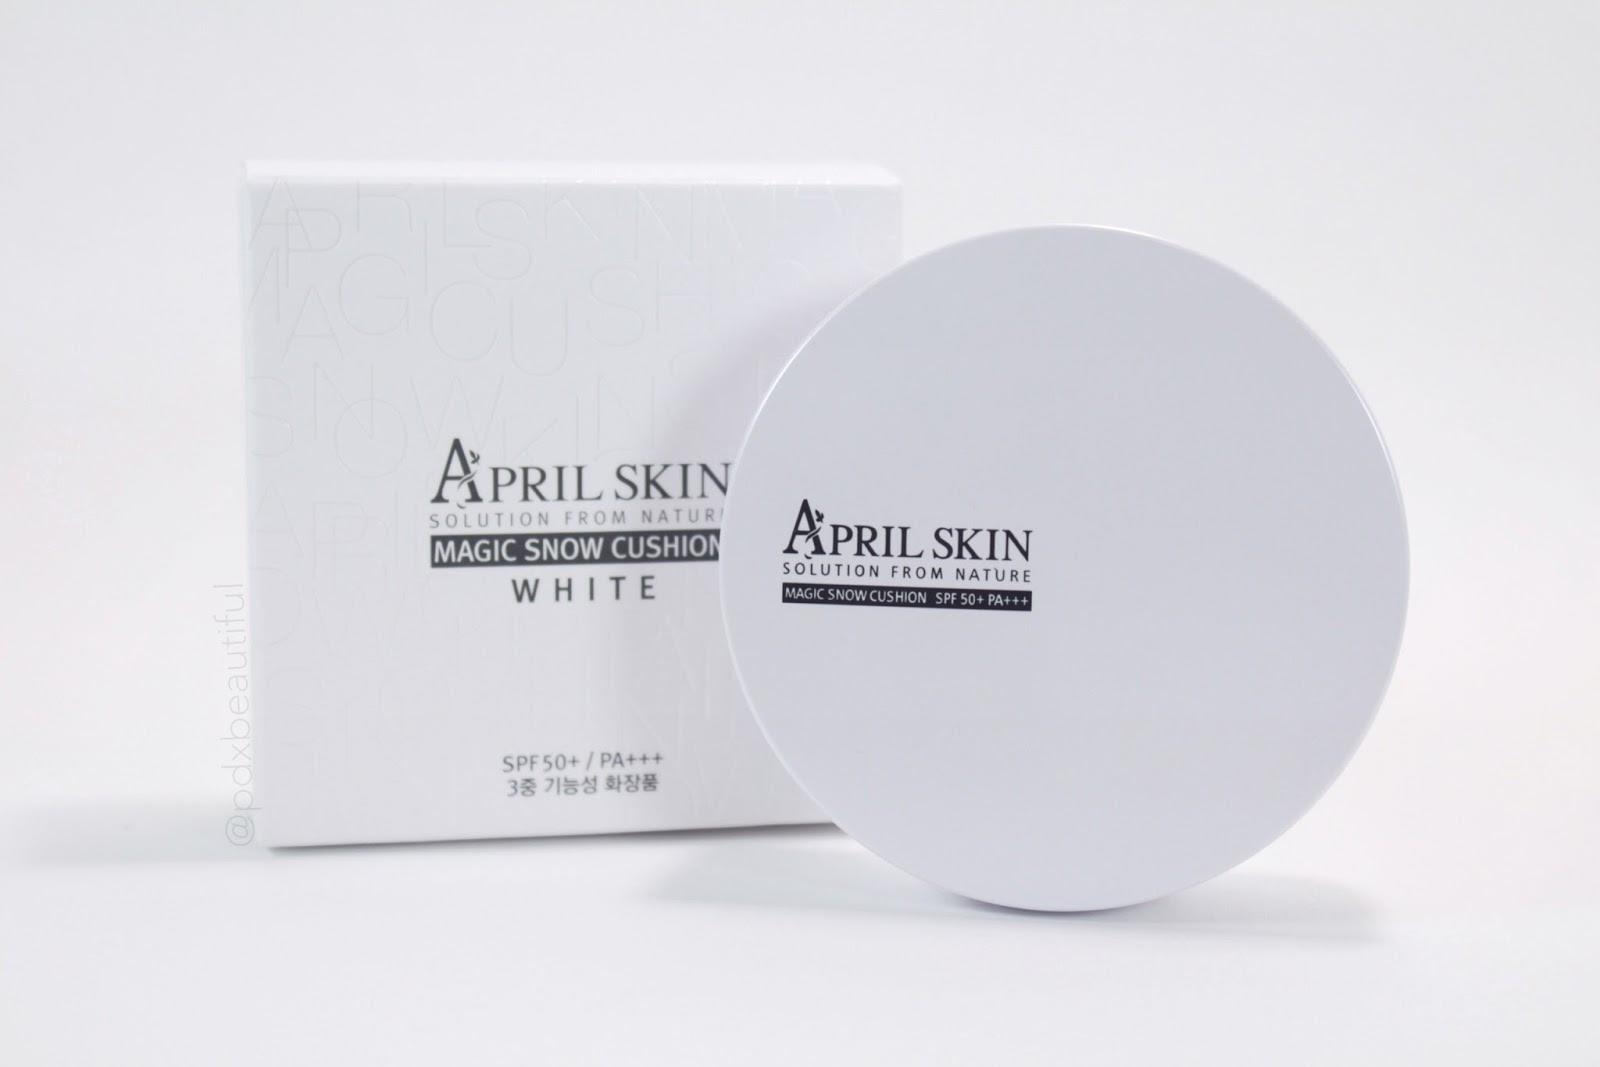 kem-bb-cream-cc-cream-phan-nuoc-april-skin-magic-snow-cushion-white-spf-50-923